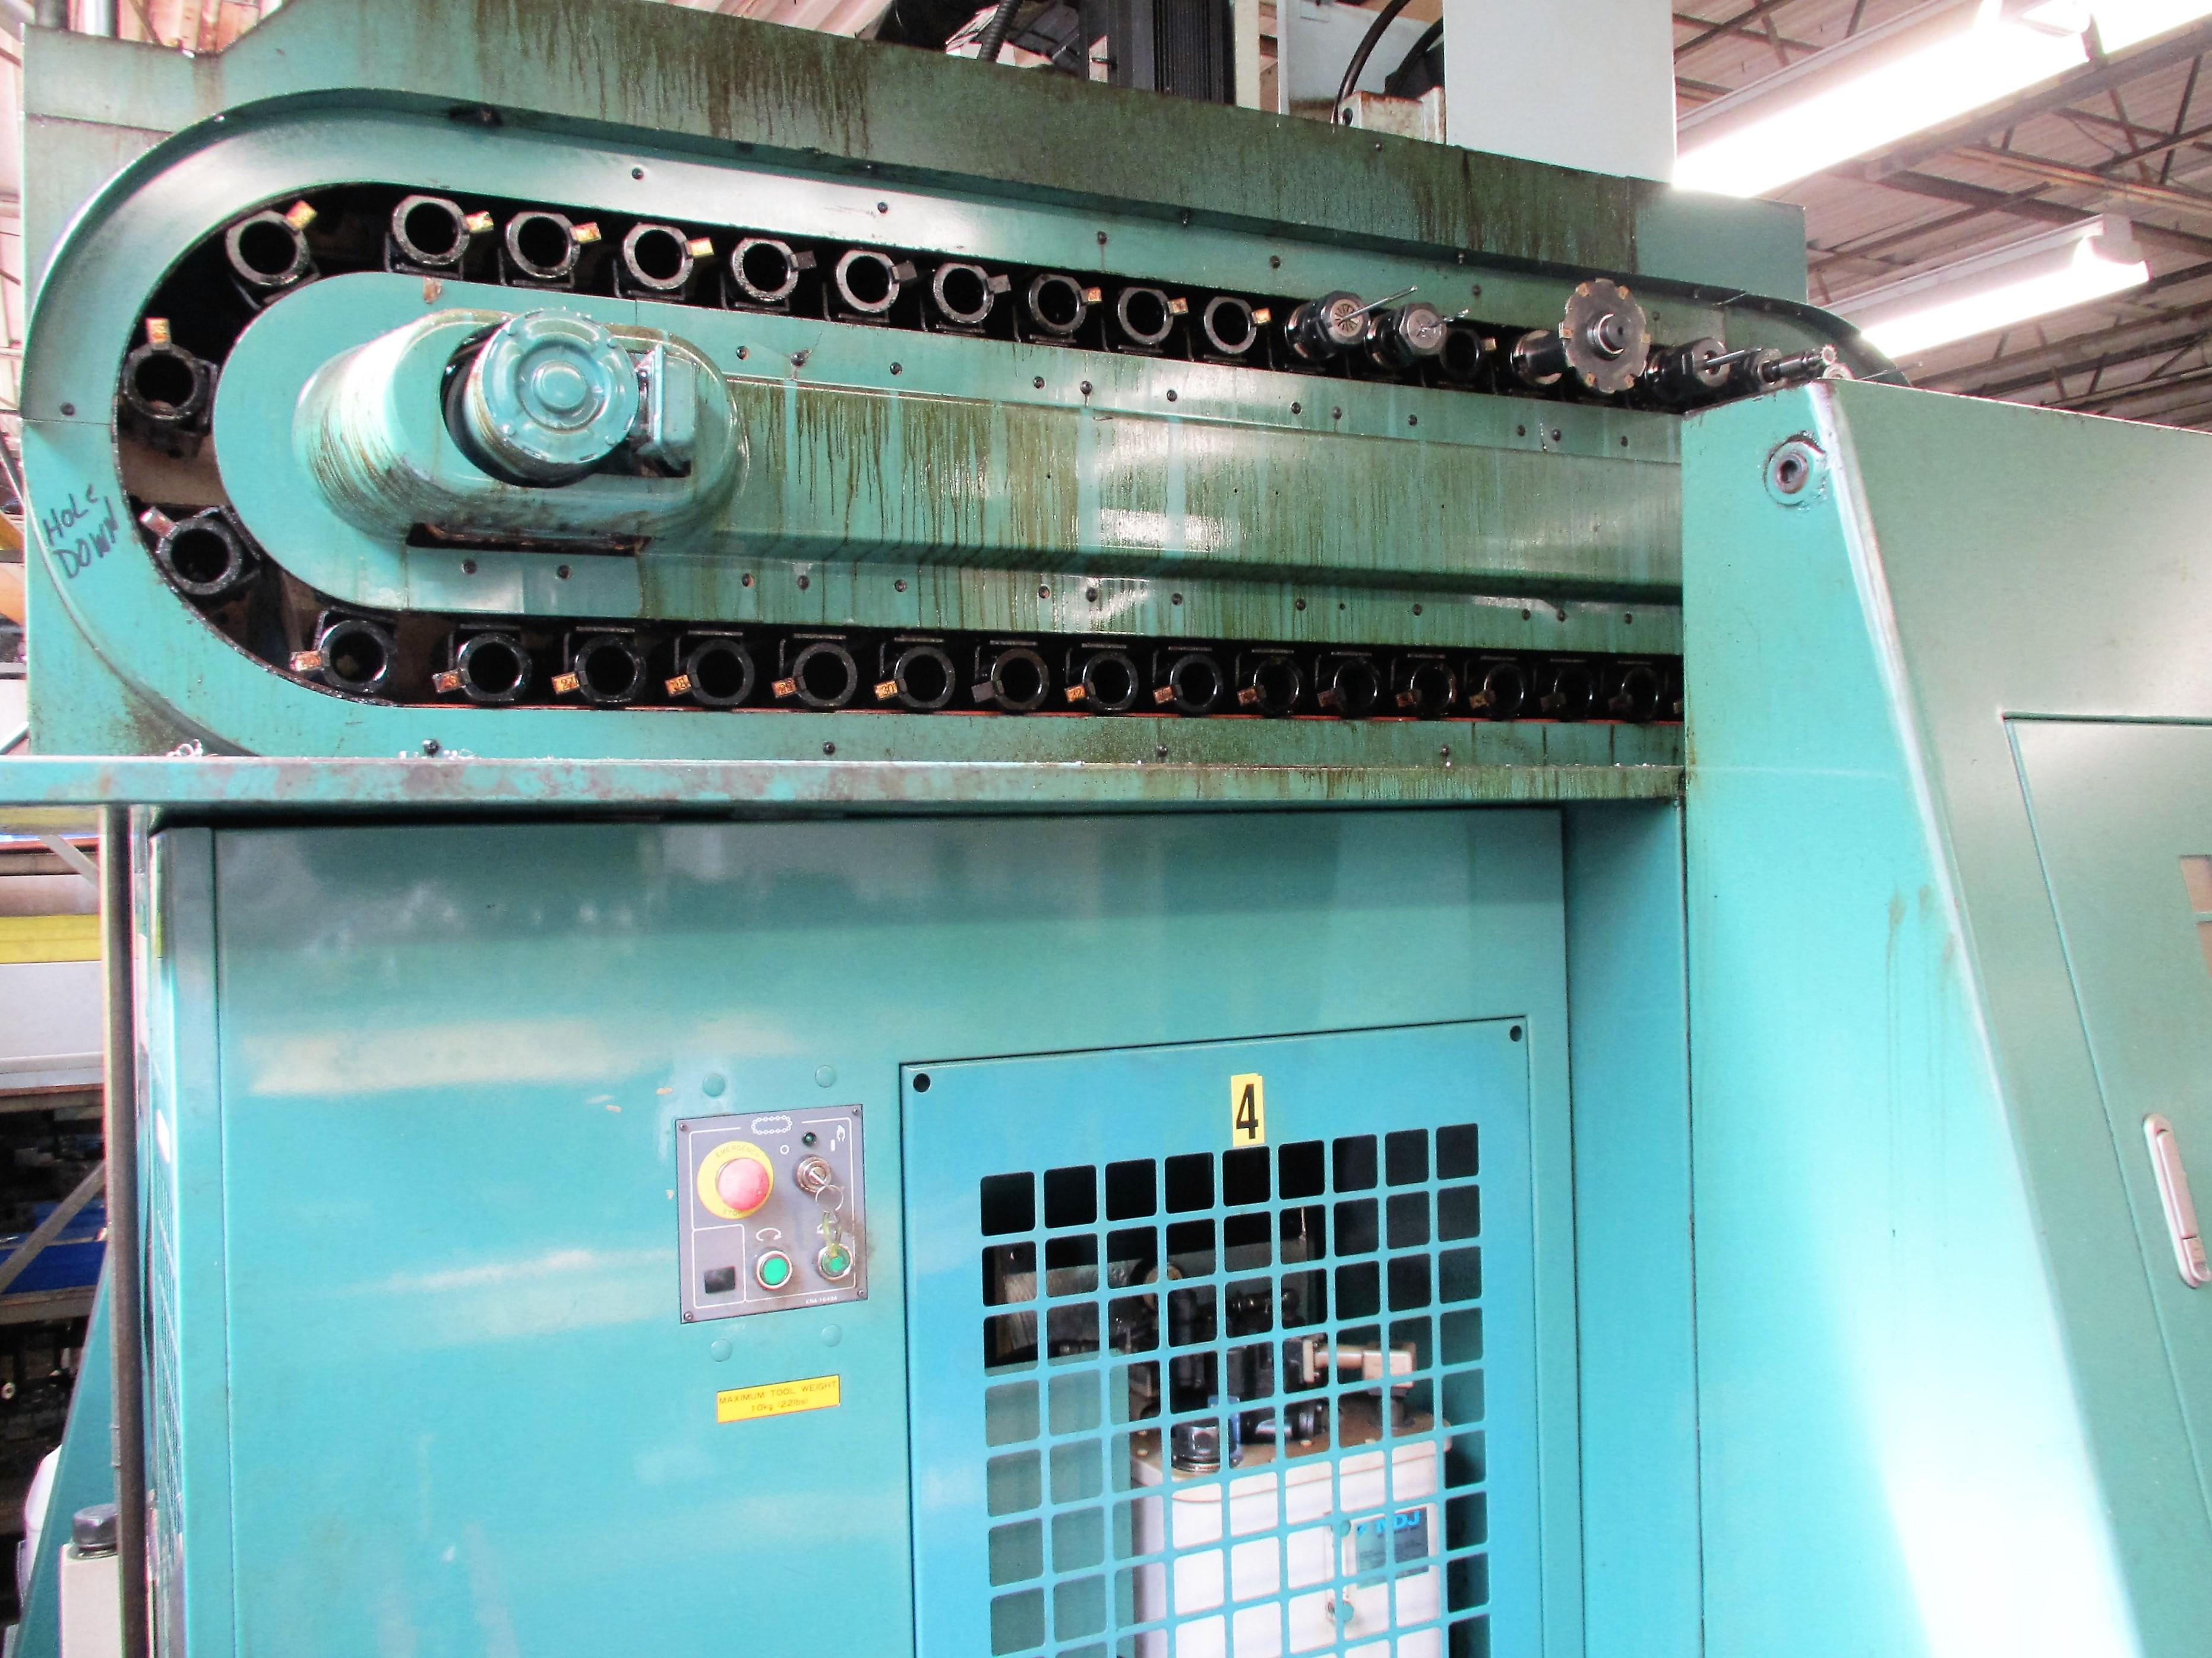 MATSUURA RA-4F CNC VERTICAL MACHINING CENTER WITH APC - Image 7 of 12